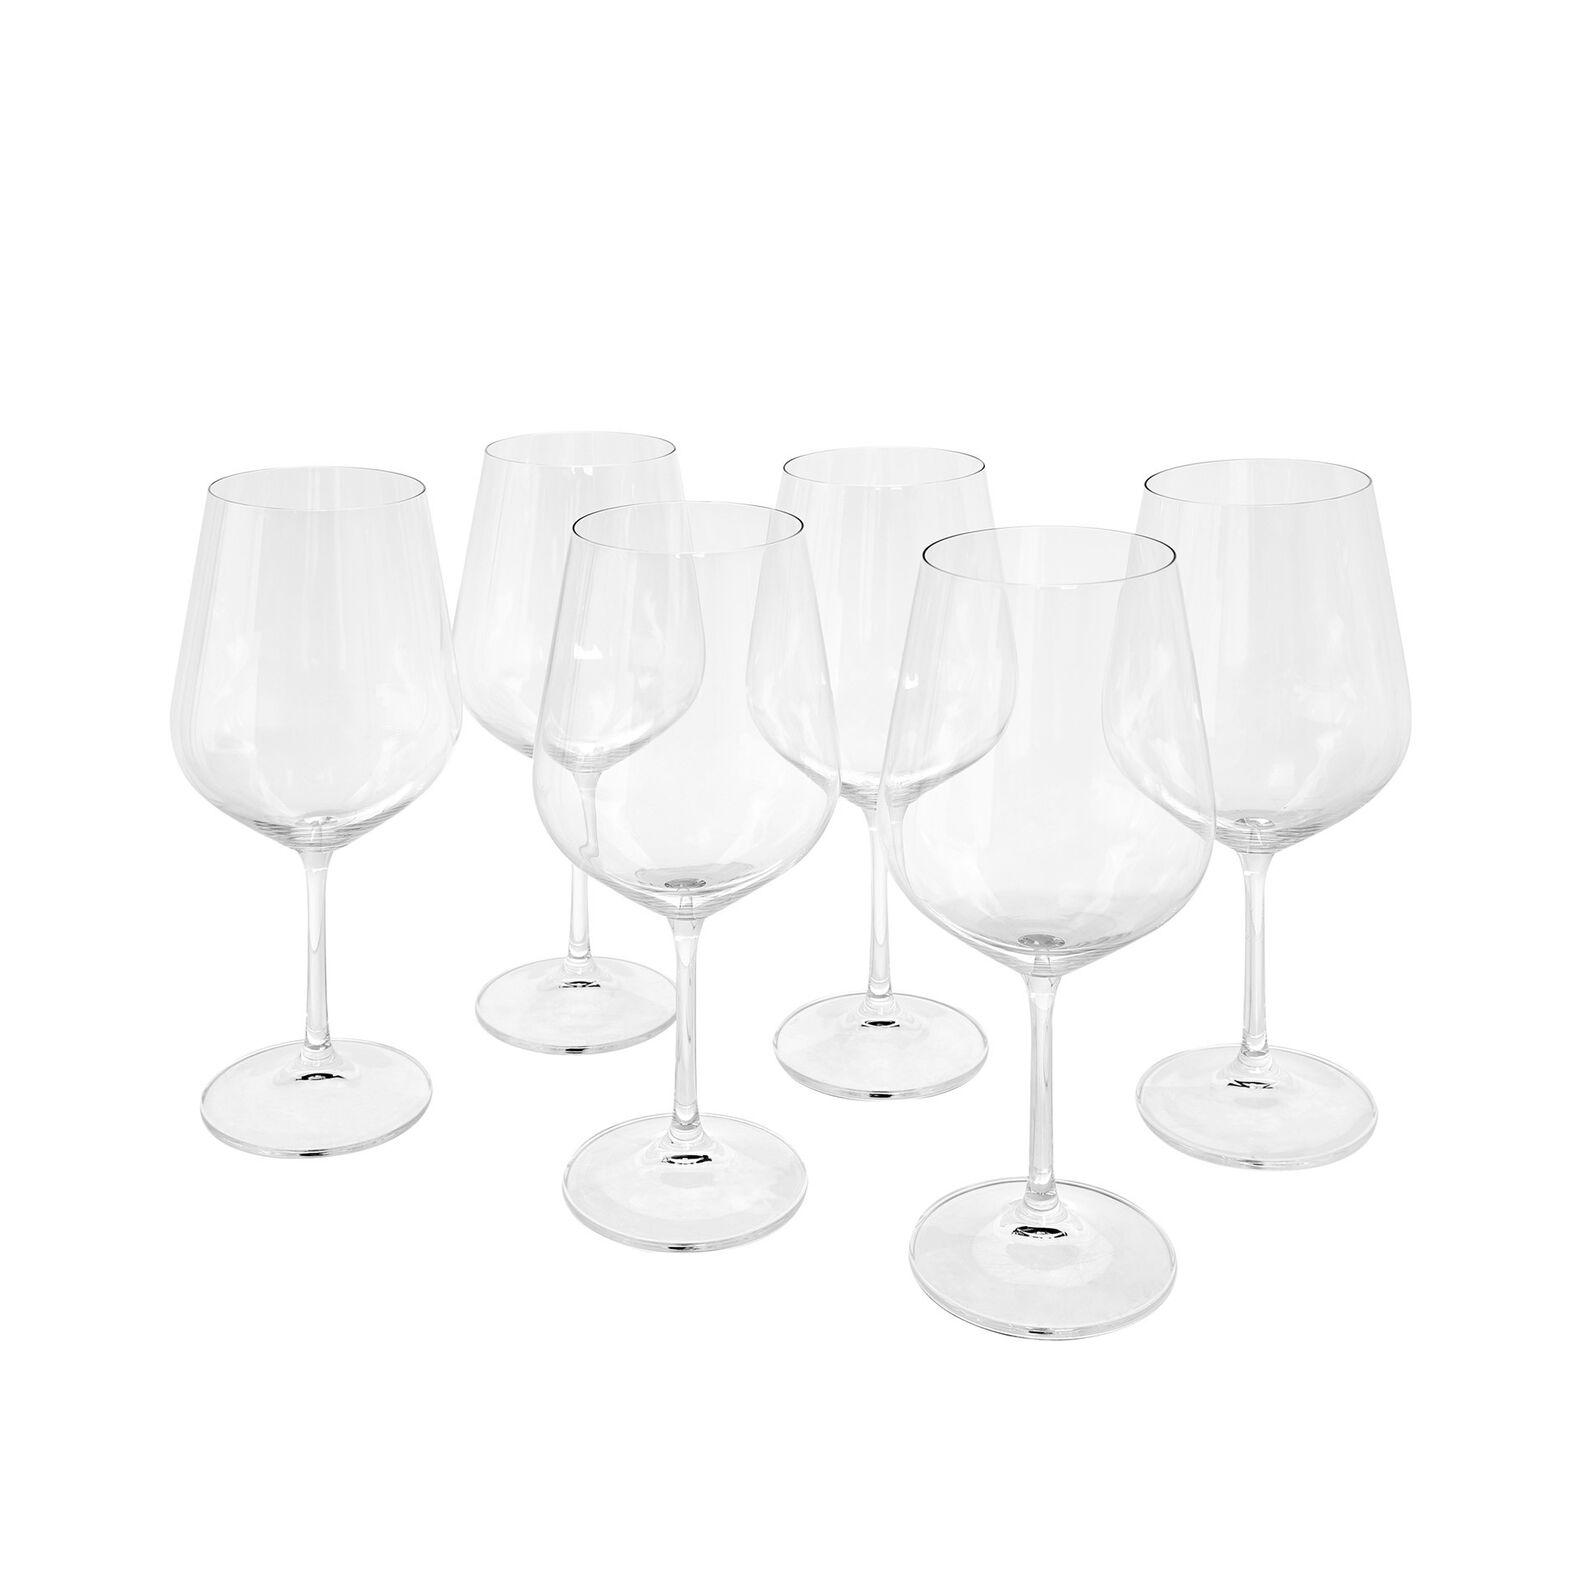 Set of 6 glass wine goblets 450 ml